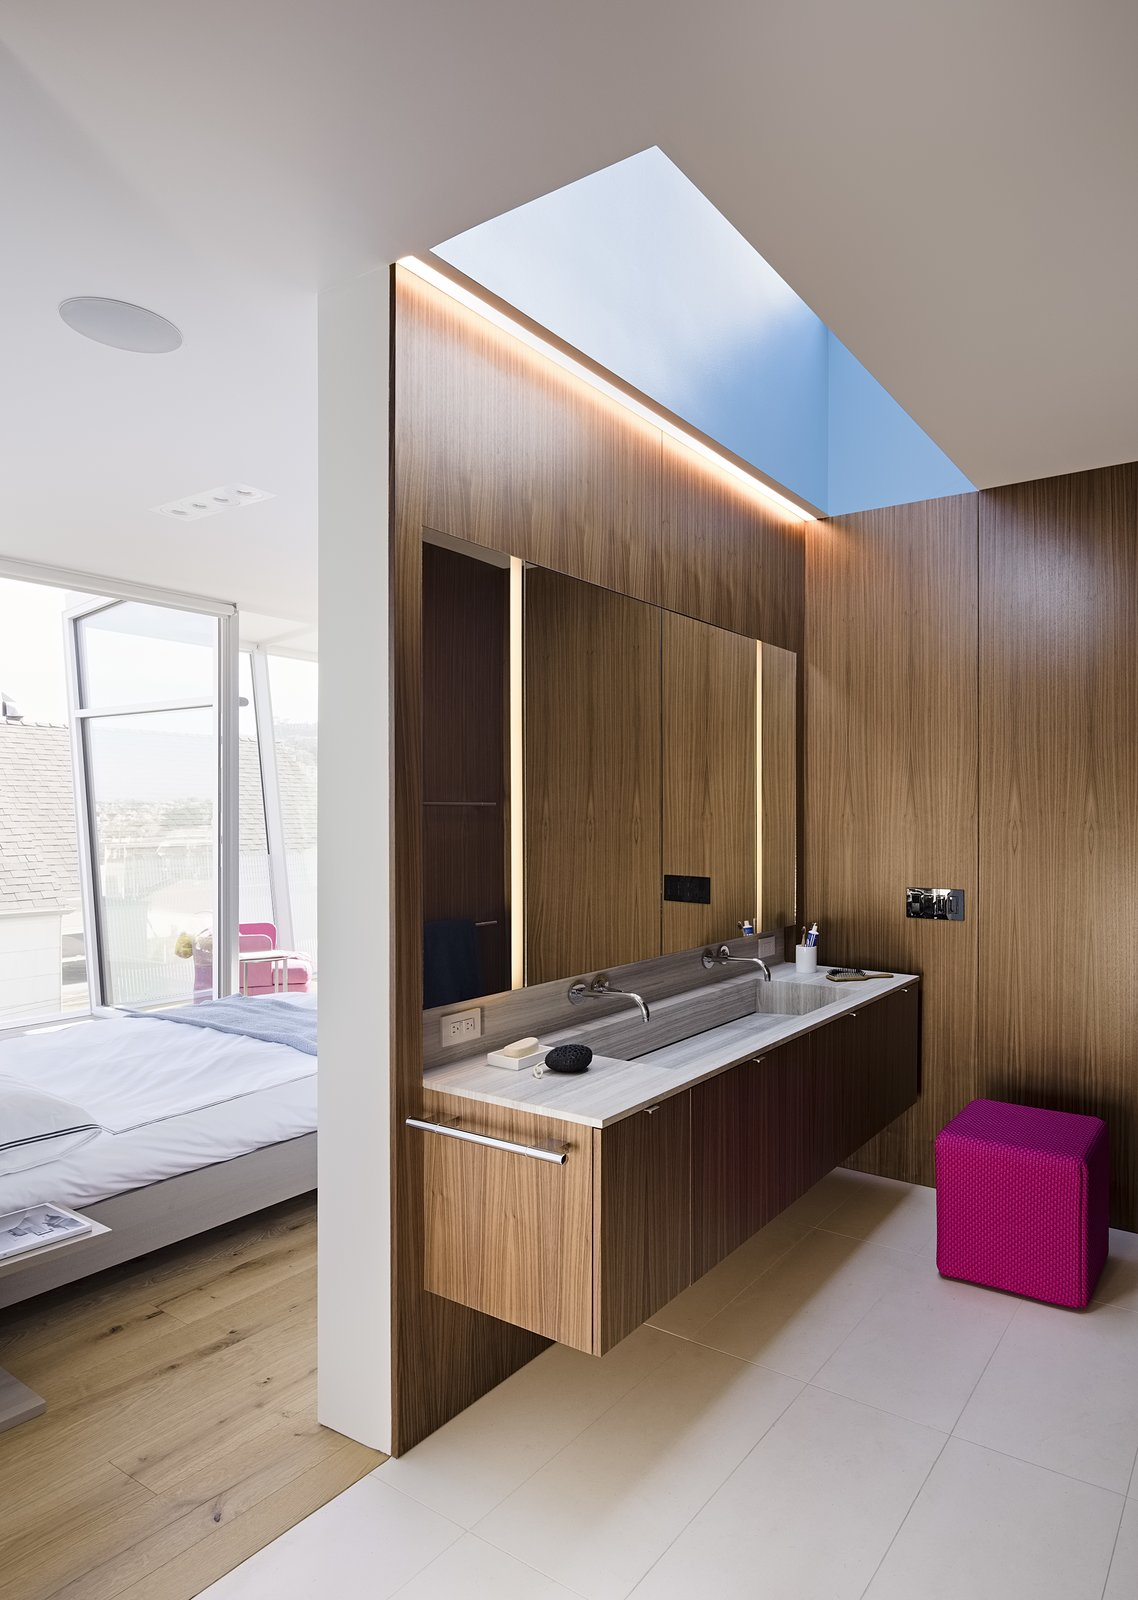 During the day, a skylight illuminates the master bathroom.